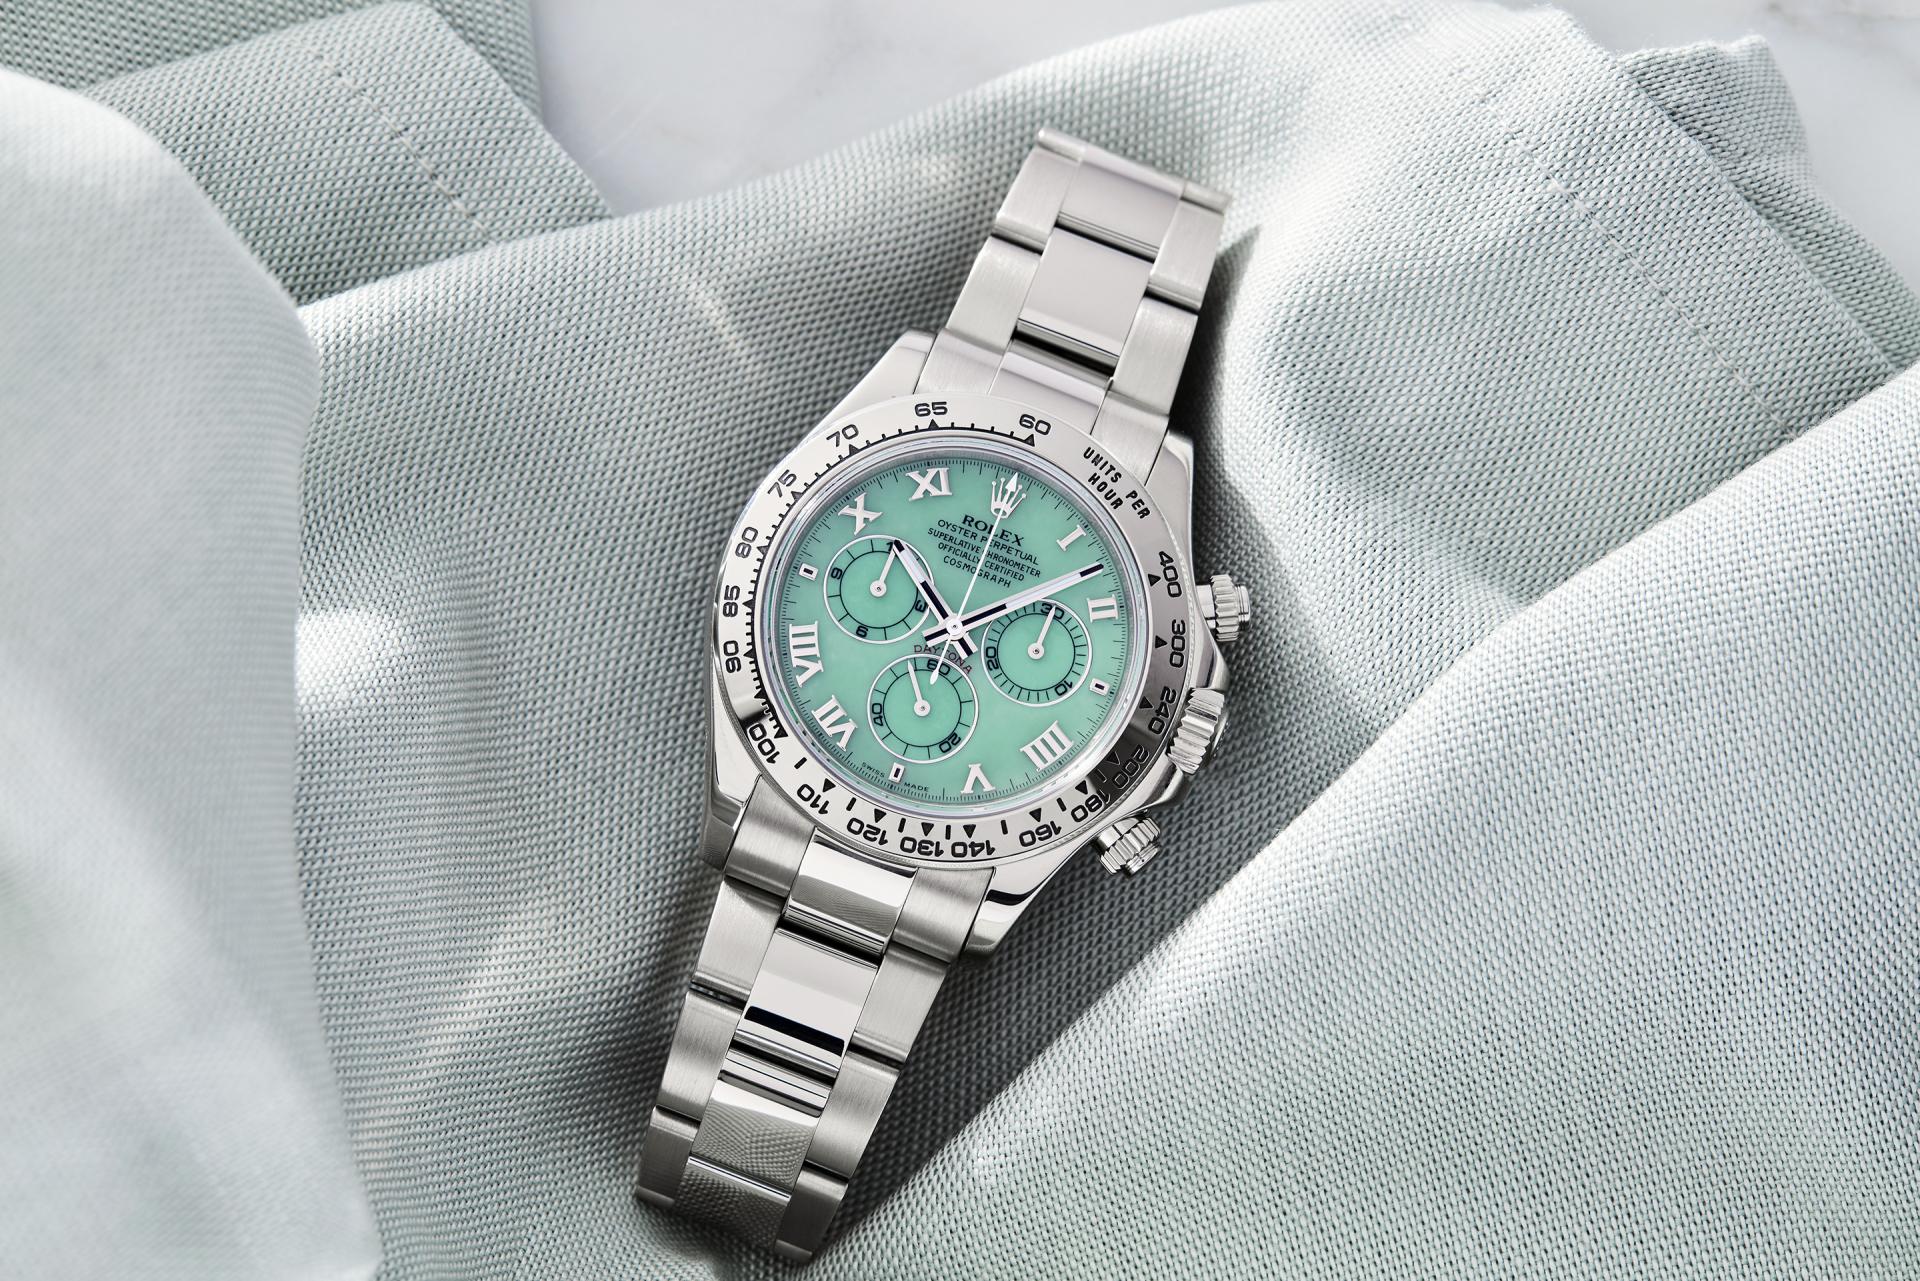 Rolex, IWC & Co – Top 5 Swiss Watch Brands